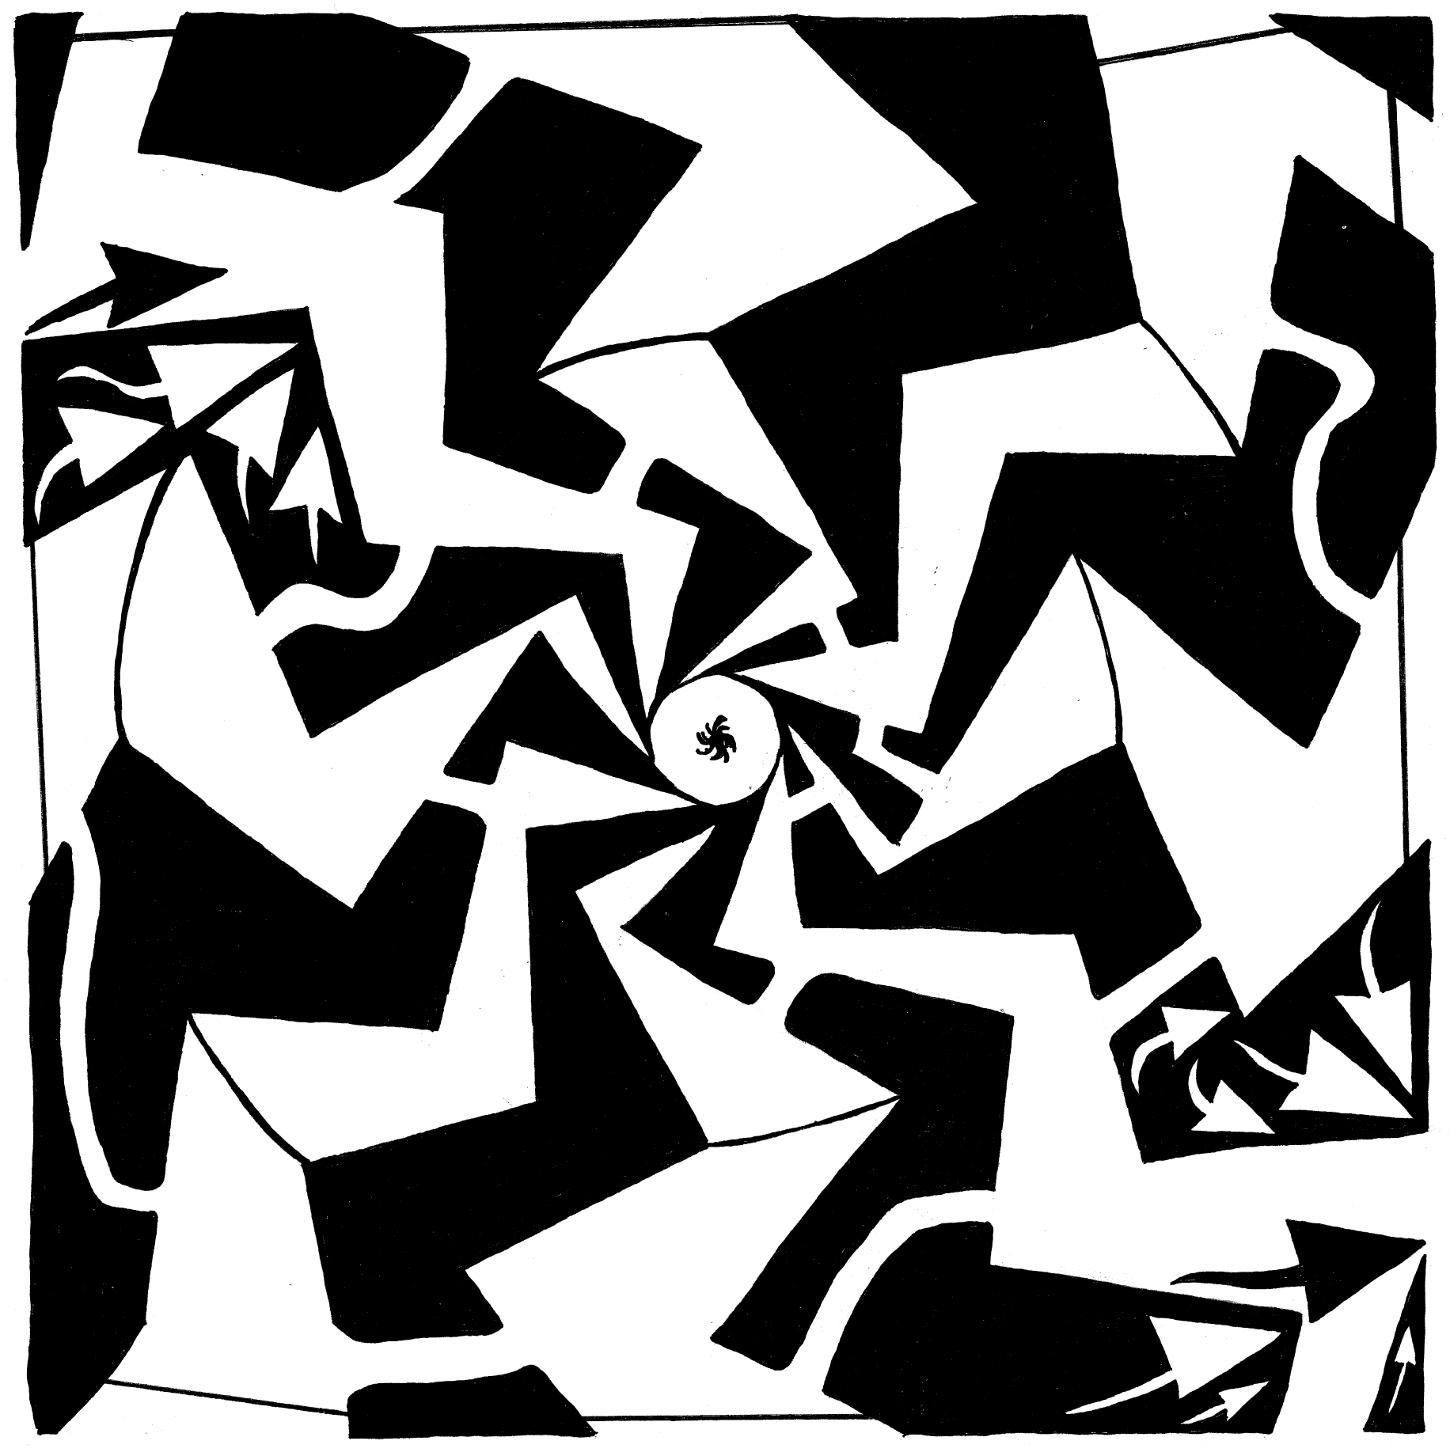 paparazzi maze art by Yonatan Frimer